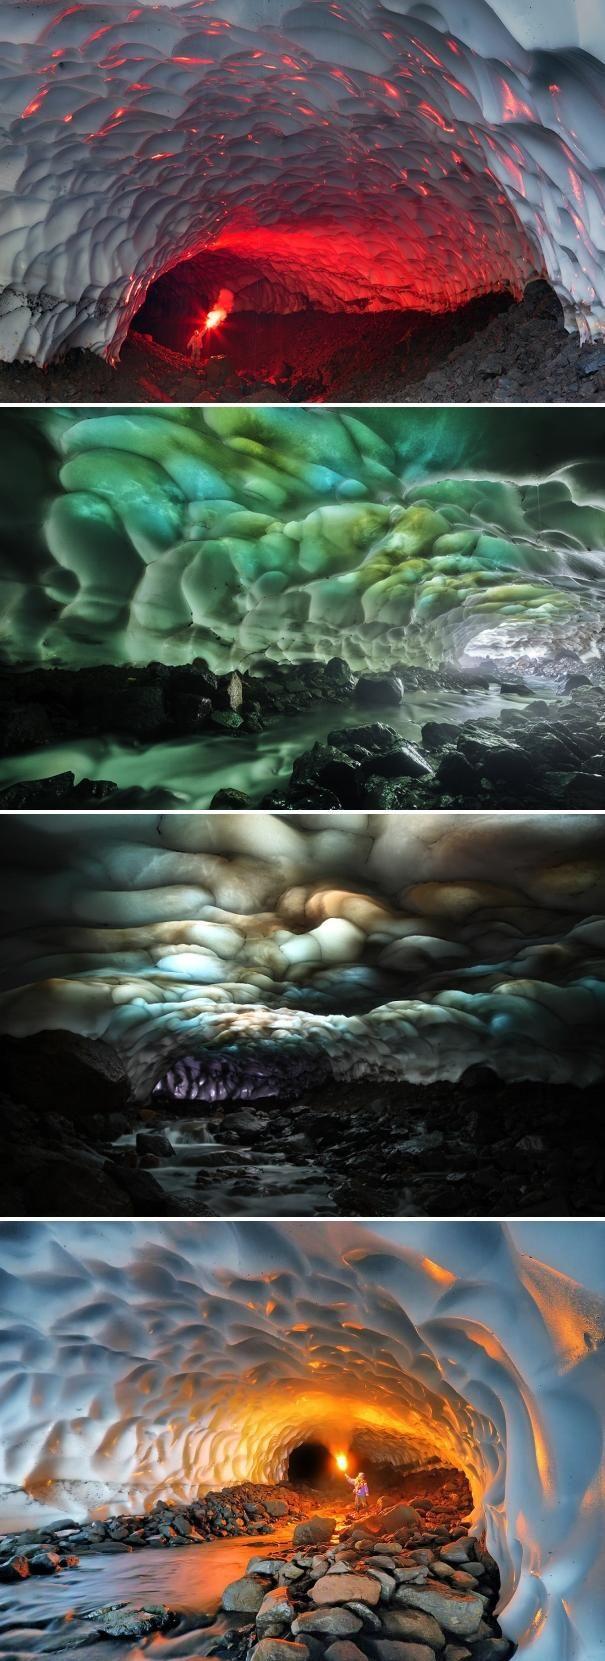 Snow cave in Kamchatka, Siberia, Russia - dreamista.gr